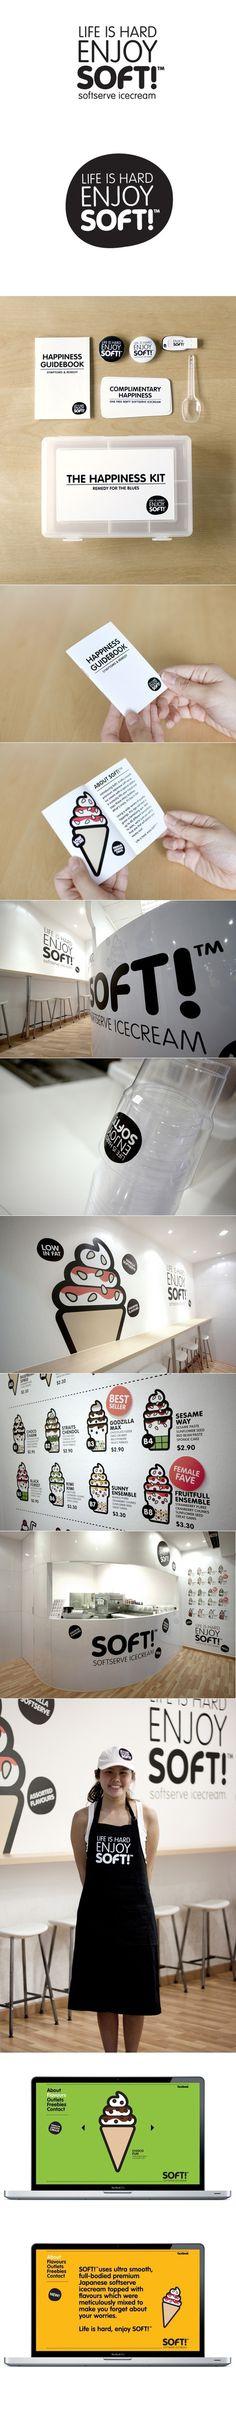 SoftTM branding by Bravo Company #cream #ice #branding #retail